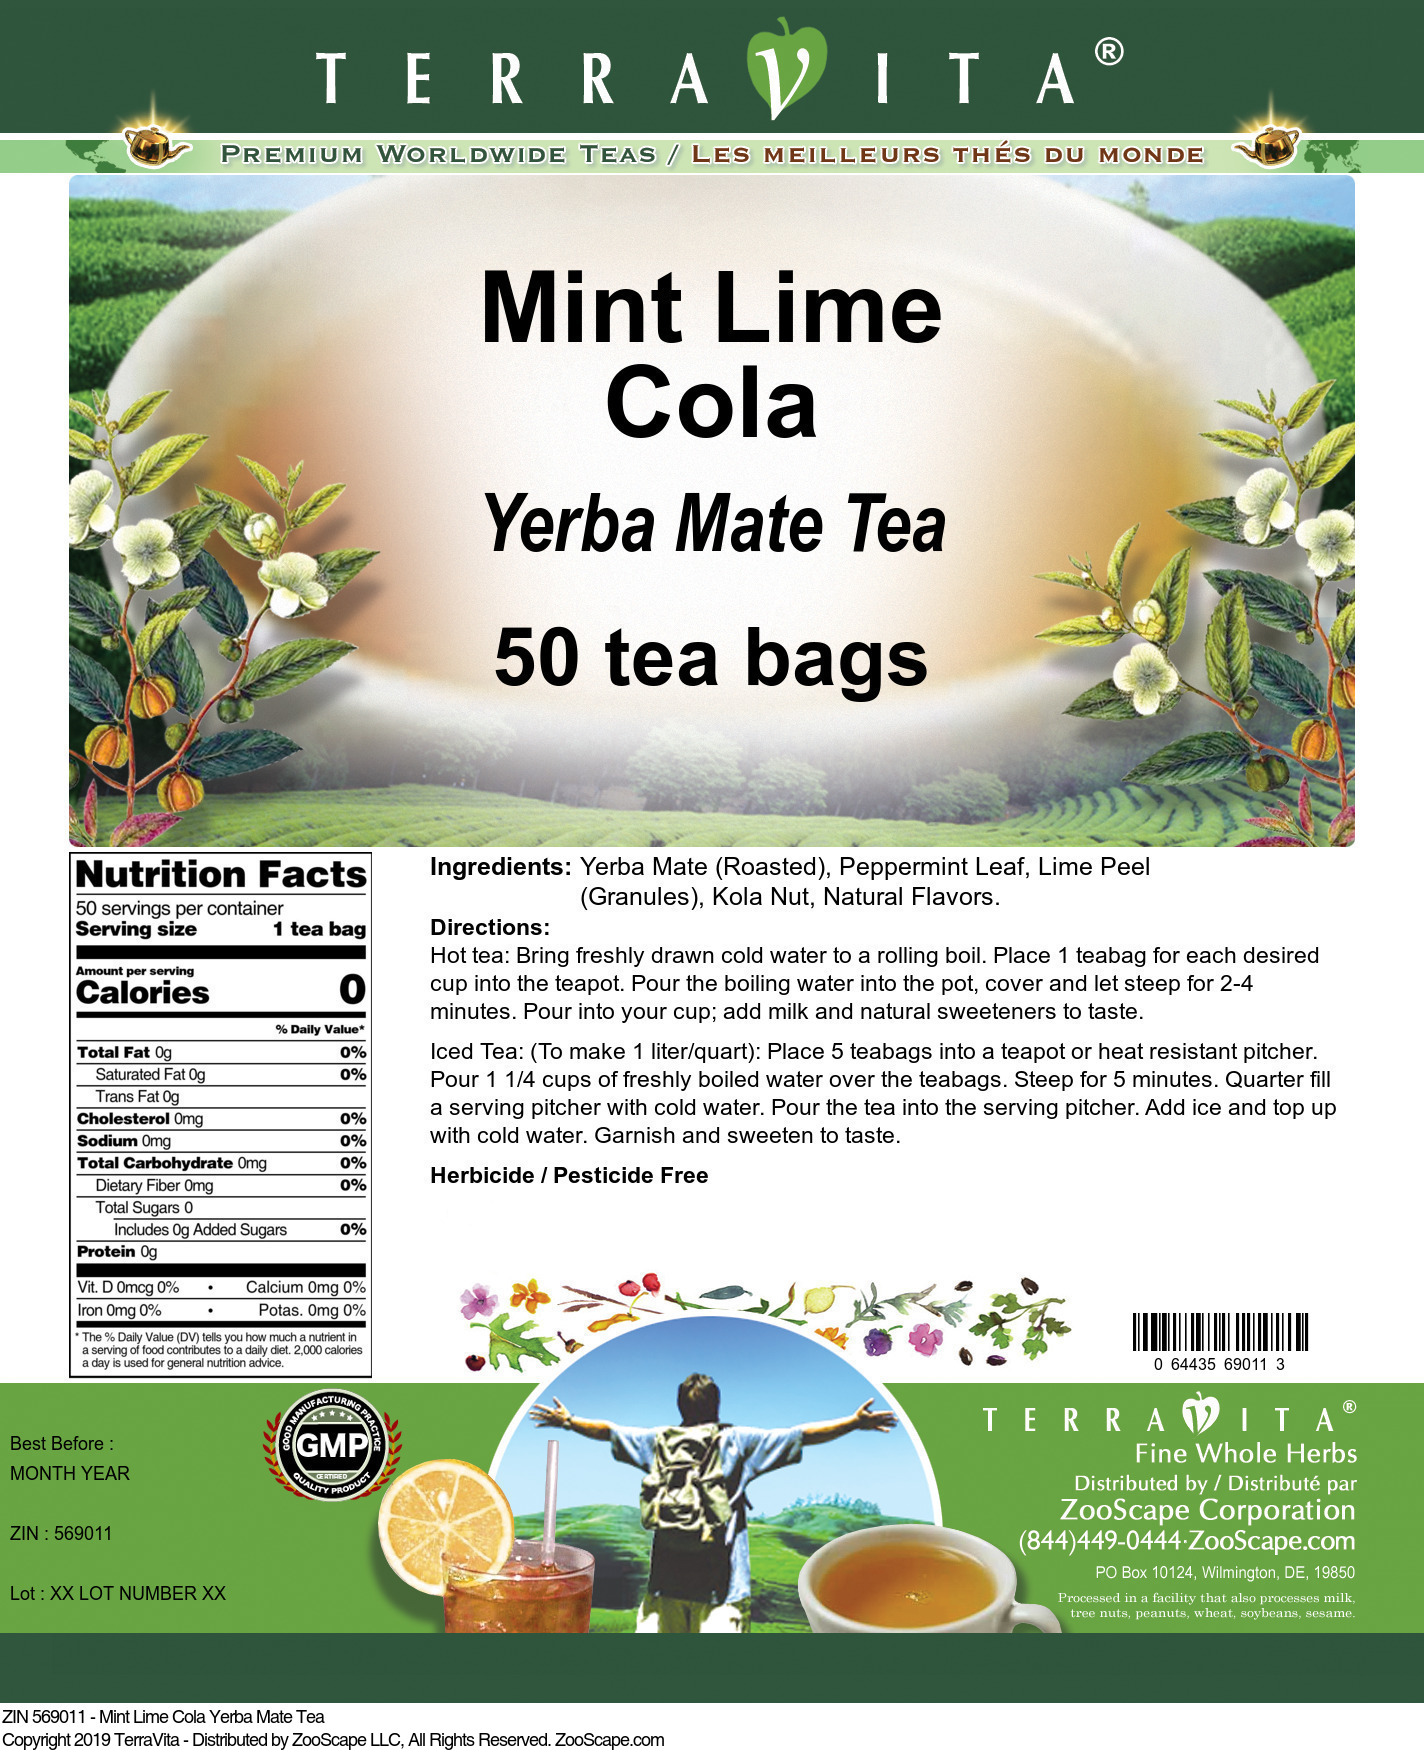 Mint Lime Cola Yerba Mate